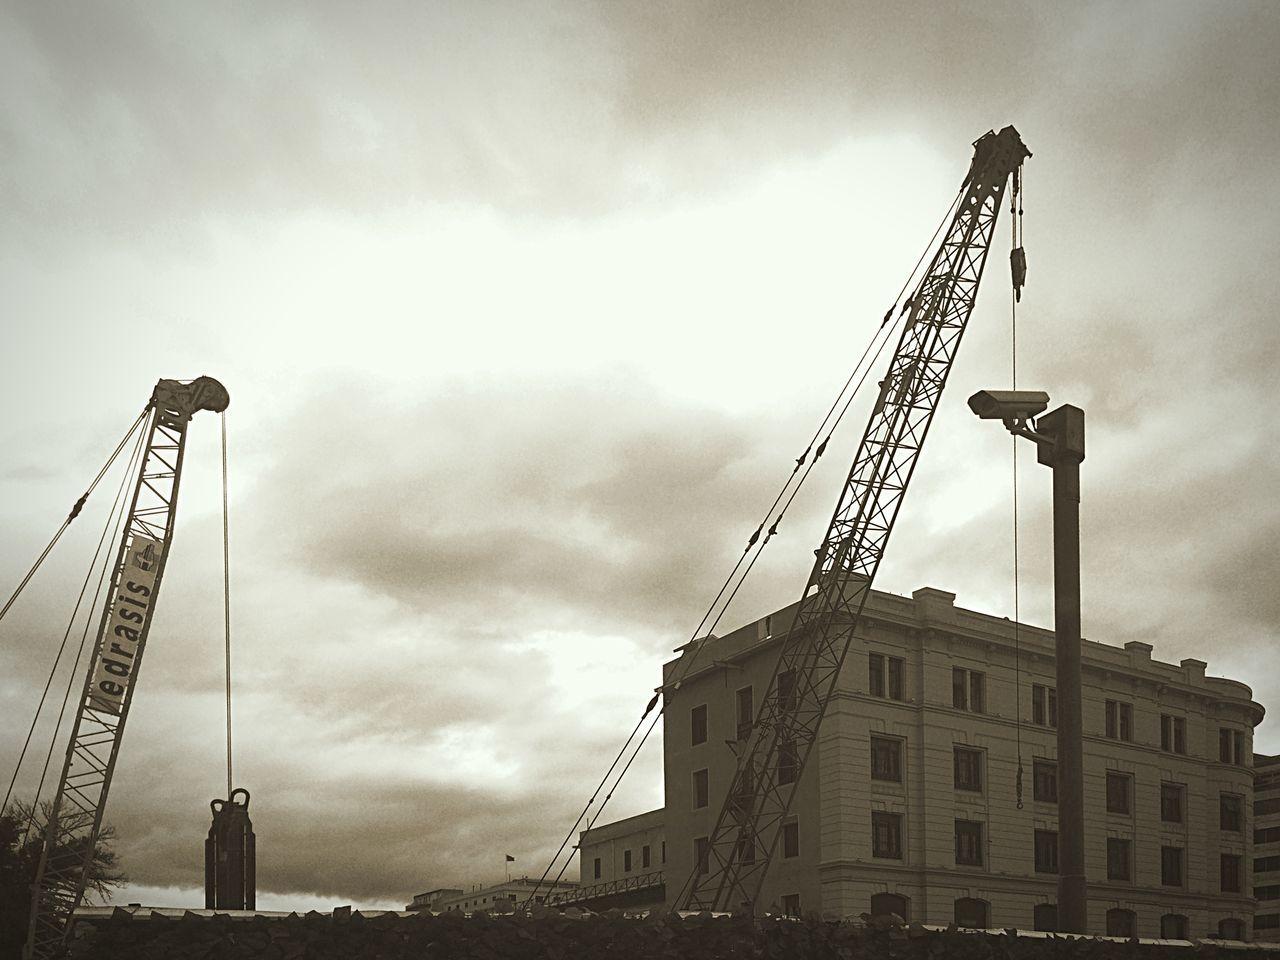 Industrial Scenery Railway Train Station At The Port of Piraeus ✨💜 Blackandwhite Urbanphotography Urban Landscape Urban Architecture